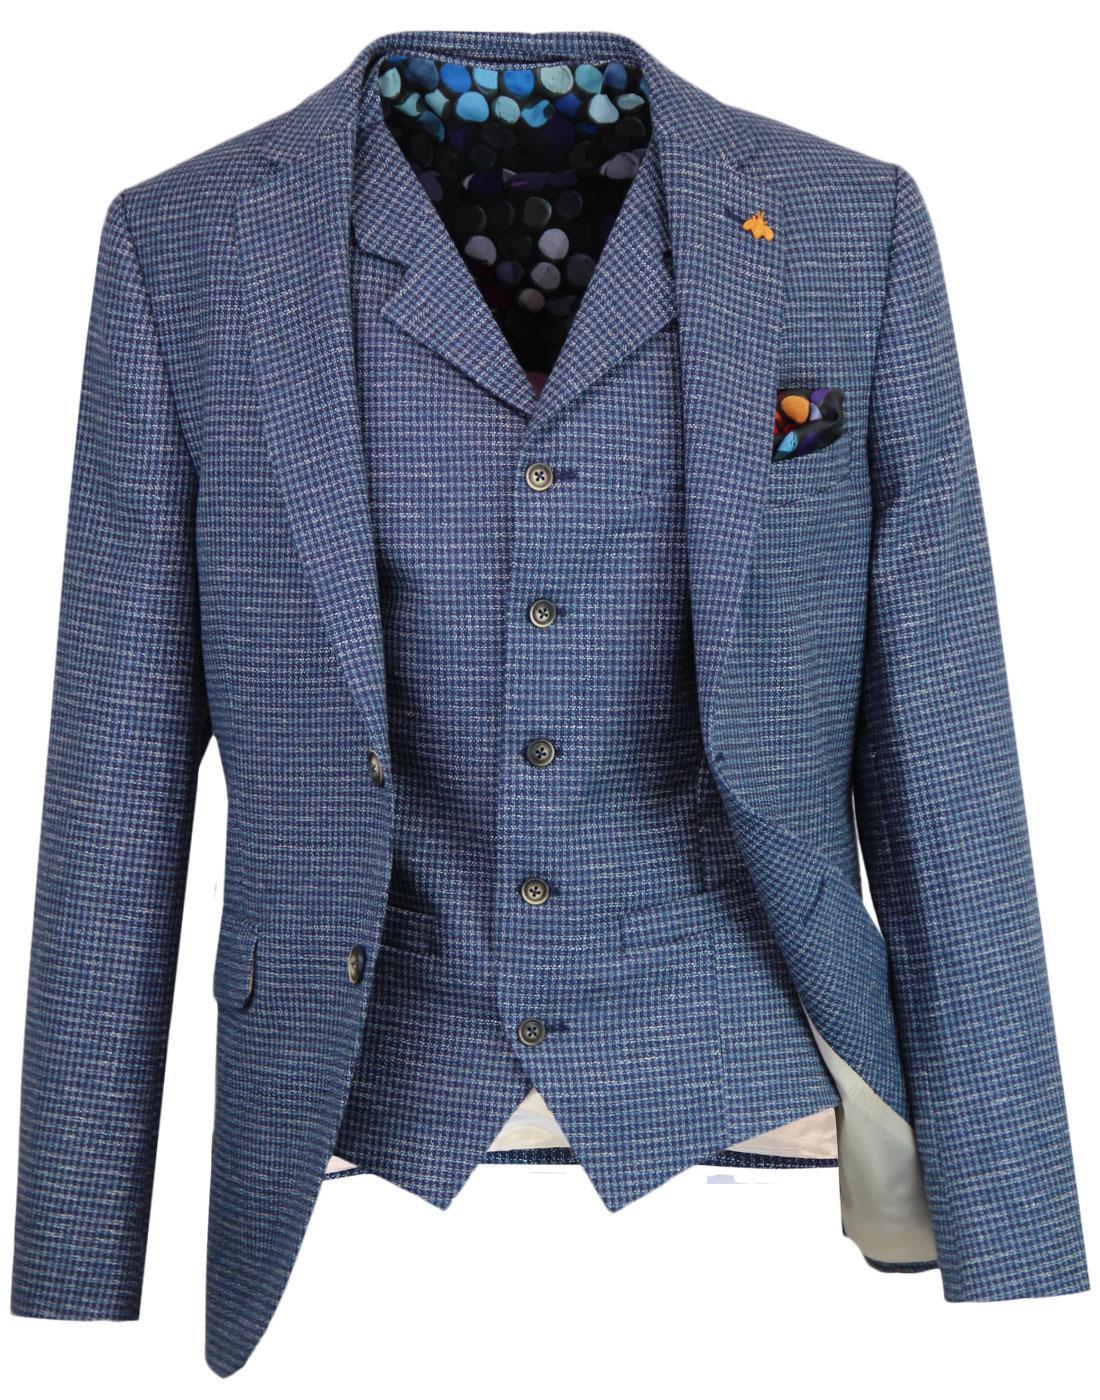 GIBSON LONDON Matching Moorgate Blazer & Waistcoat